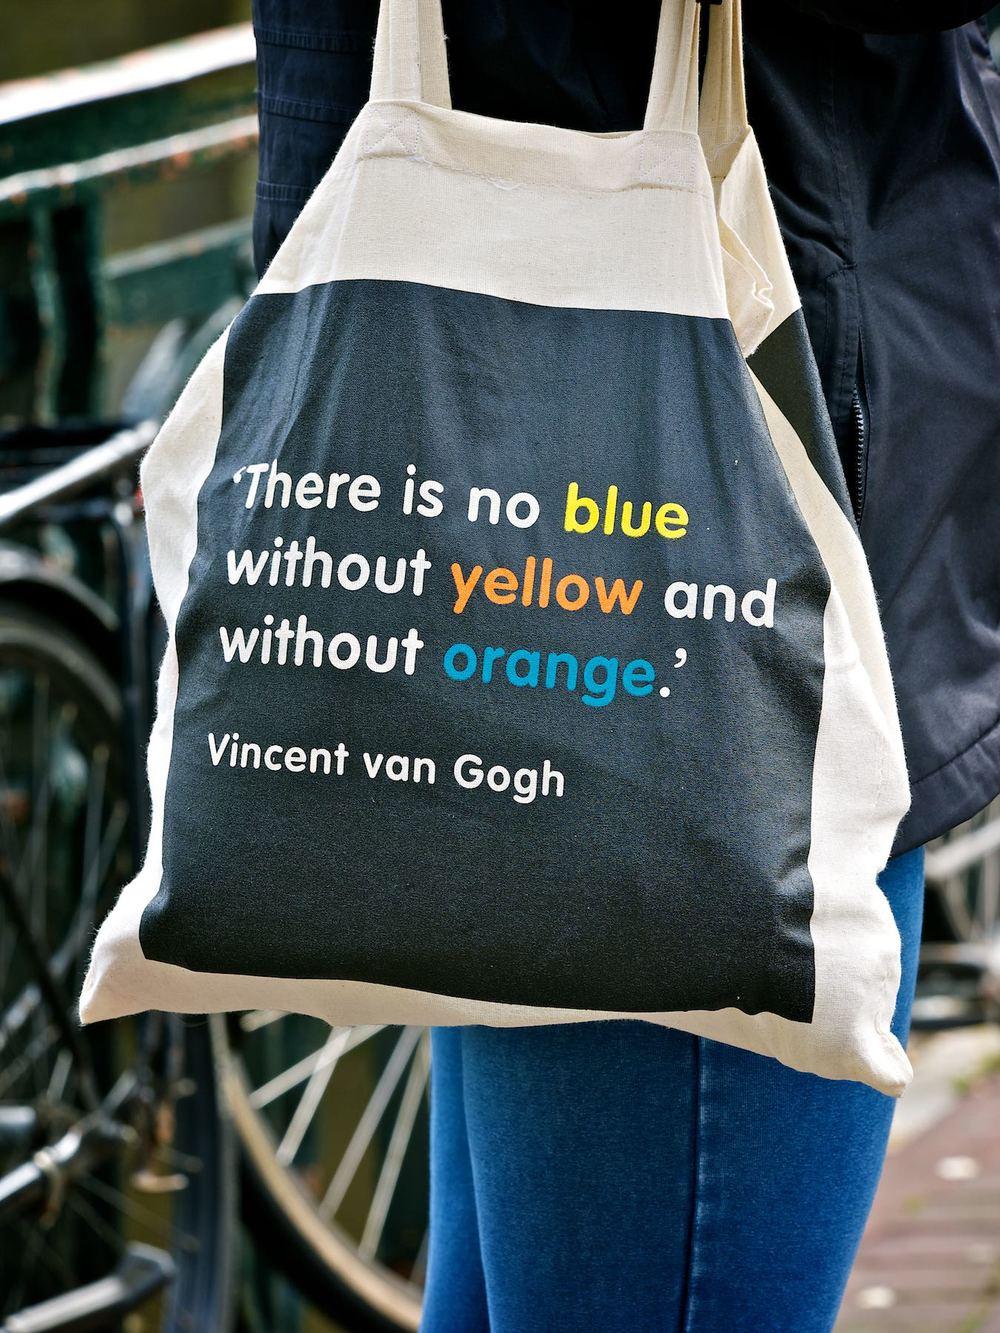 Van Gogh's words